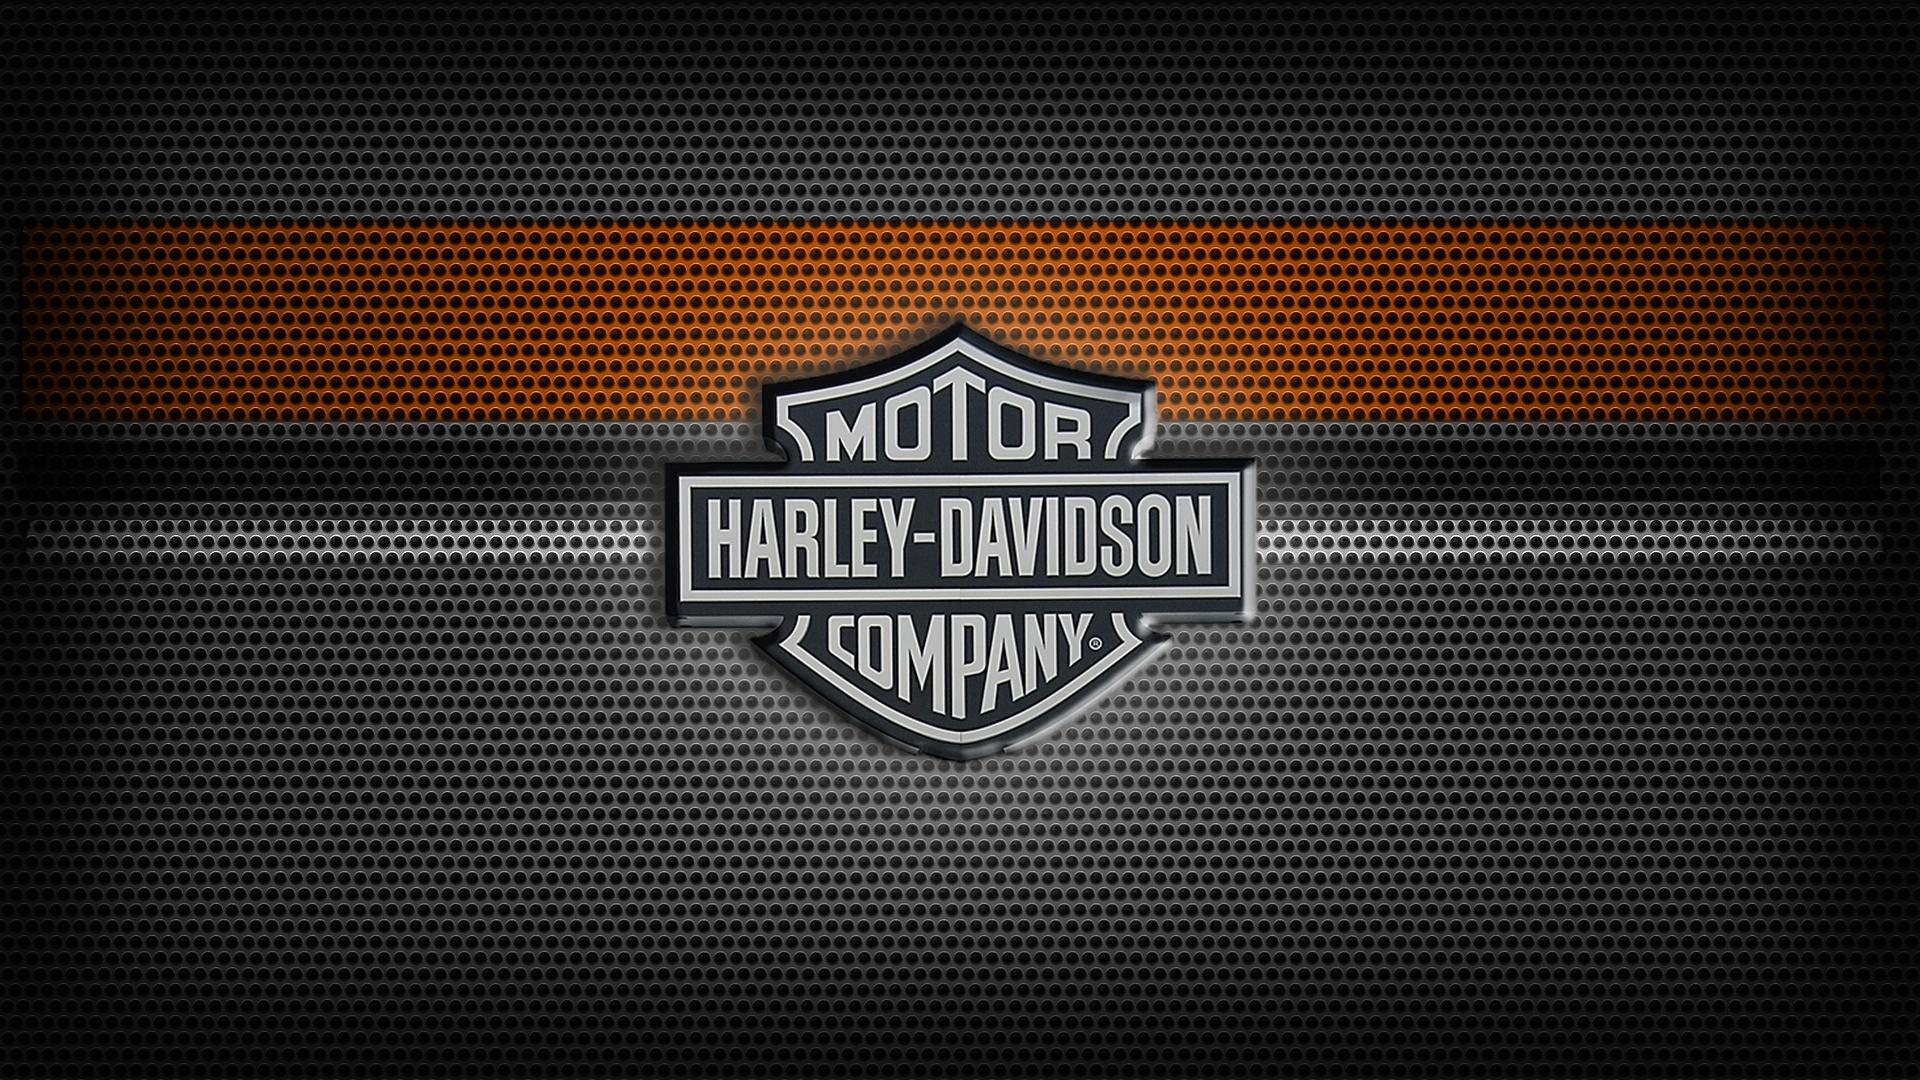 Must see Wallpaper High Resolution Harley Davidson - harley-davidson-logo-desktop-wallpaper-free-download  Gallery_53757.jpg